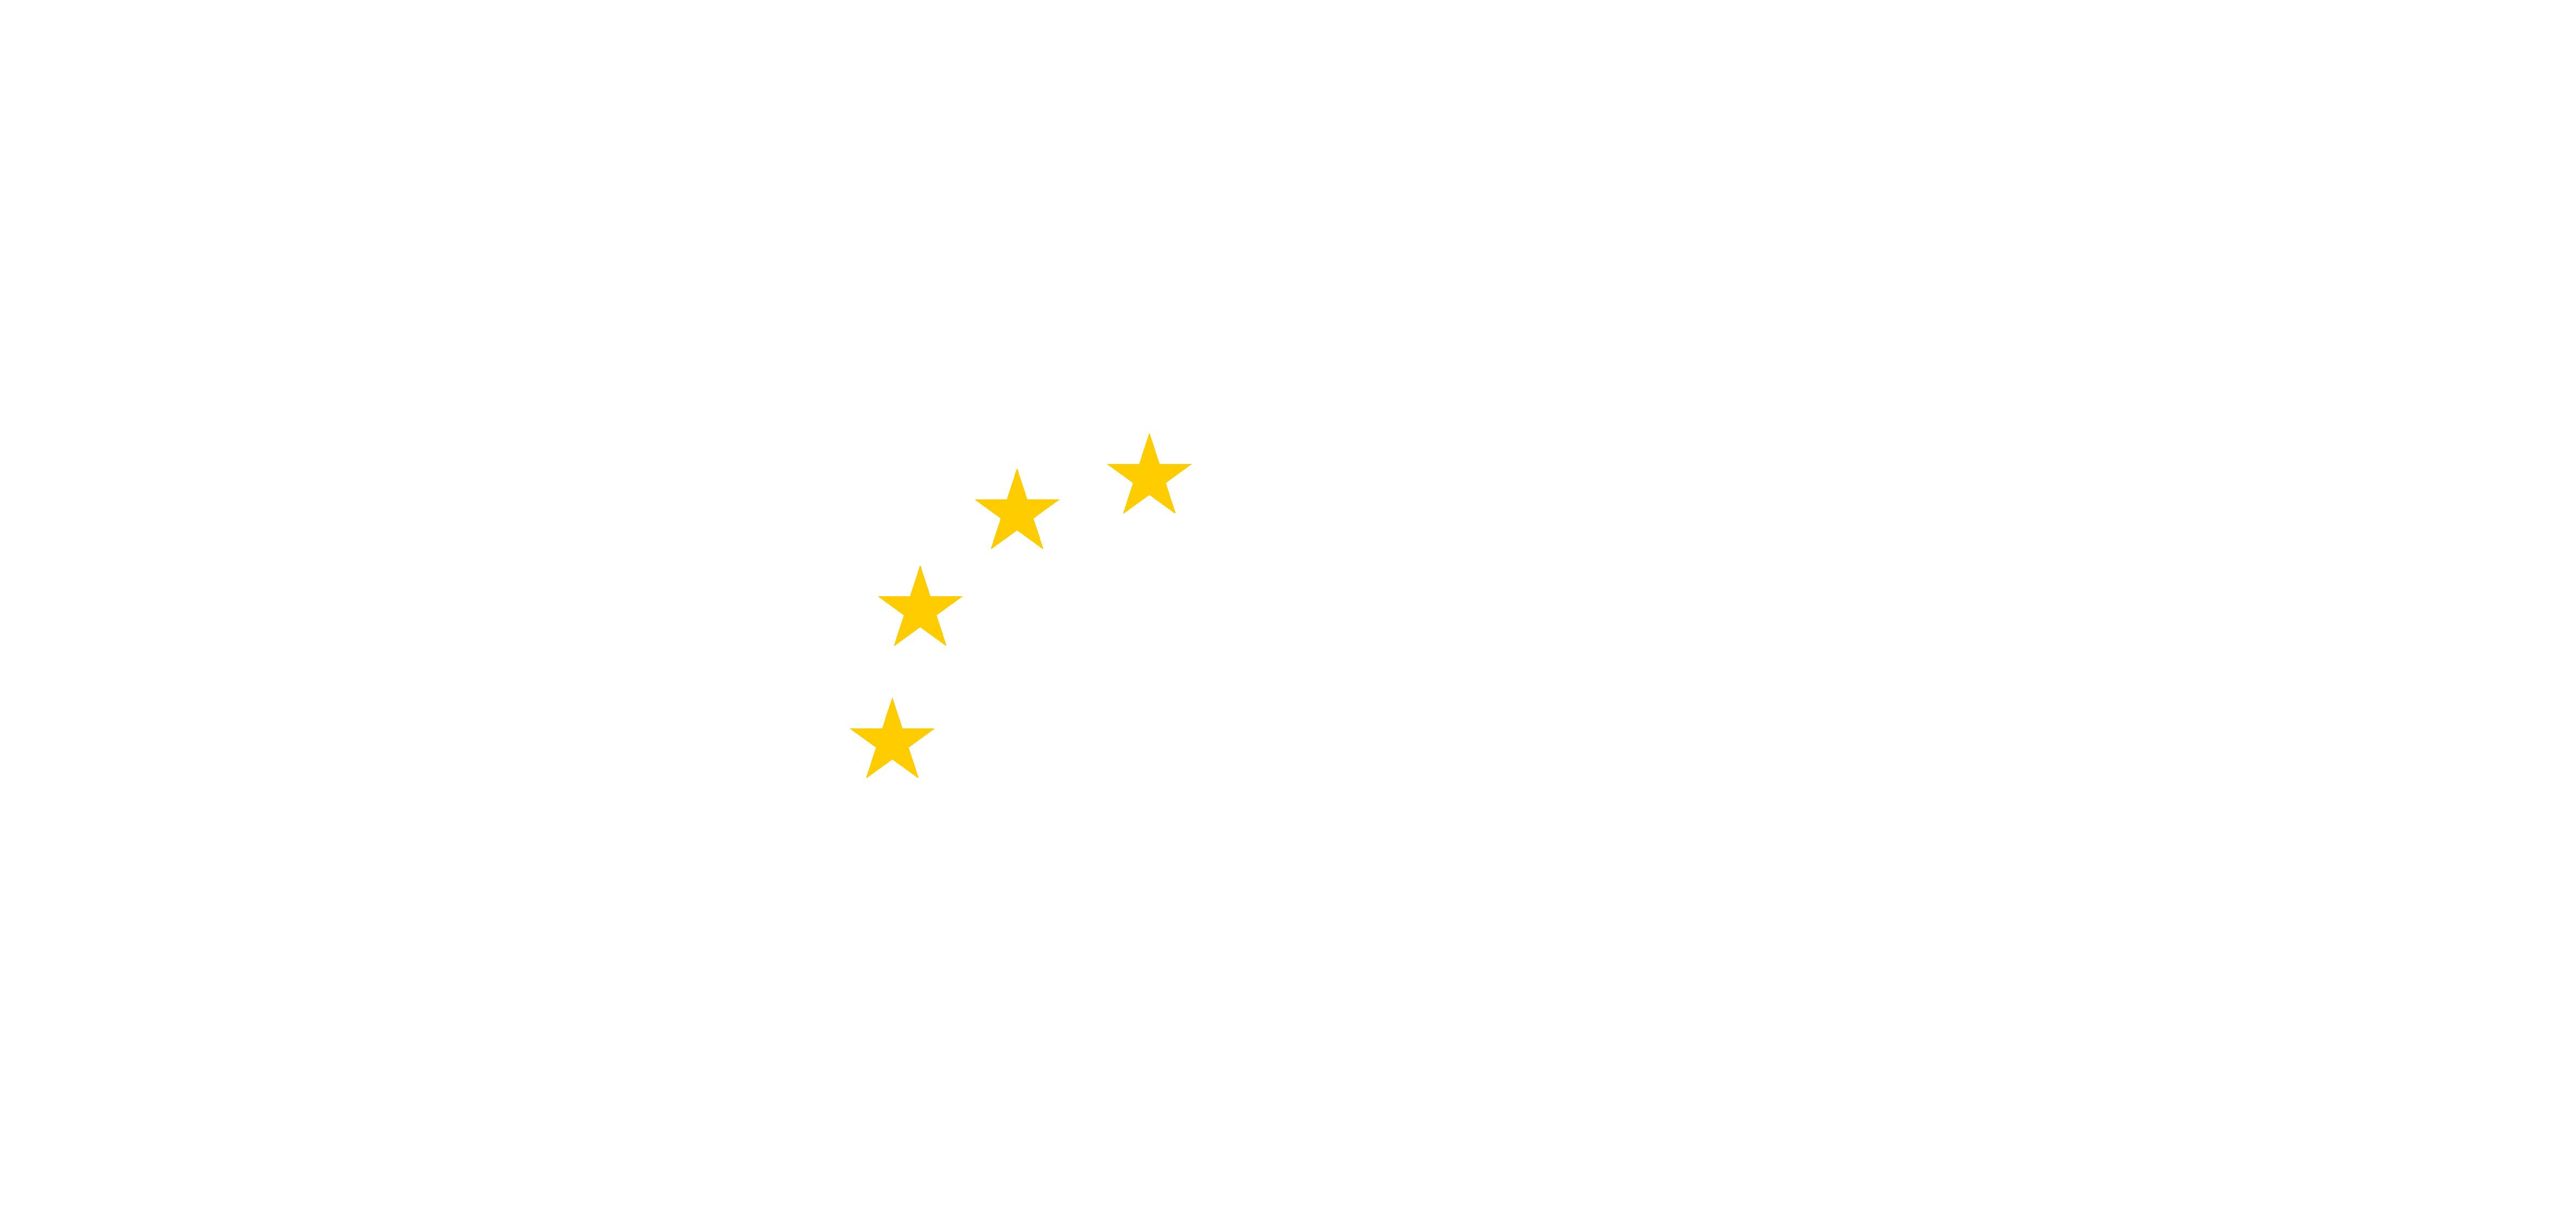 https://www.aeleadership.eu/wp-content/uploads/2021/06/AEL-Propostes-Logo-06.png